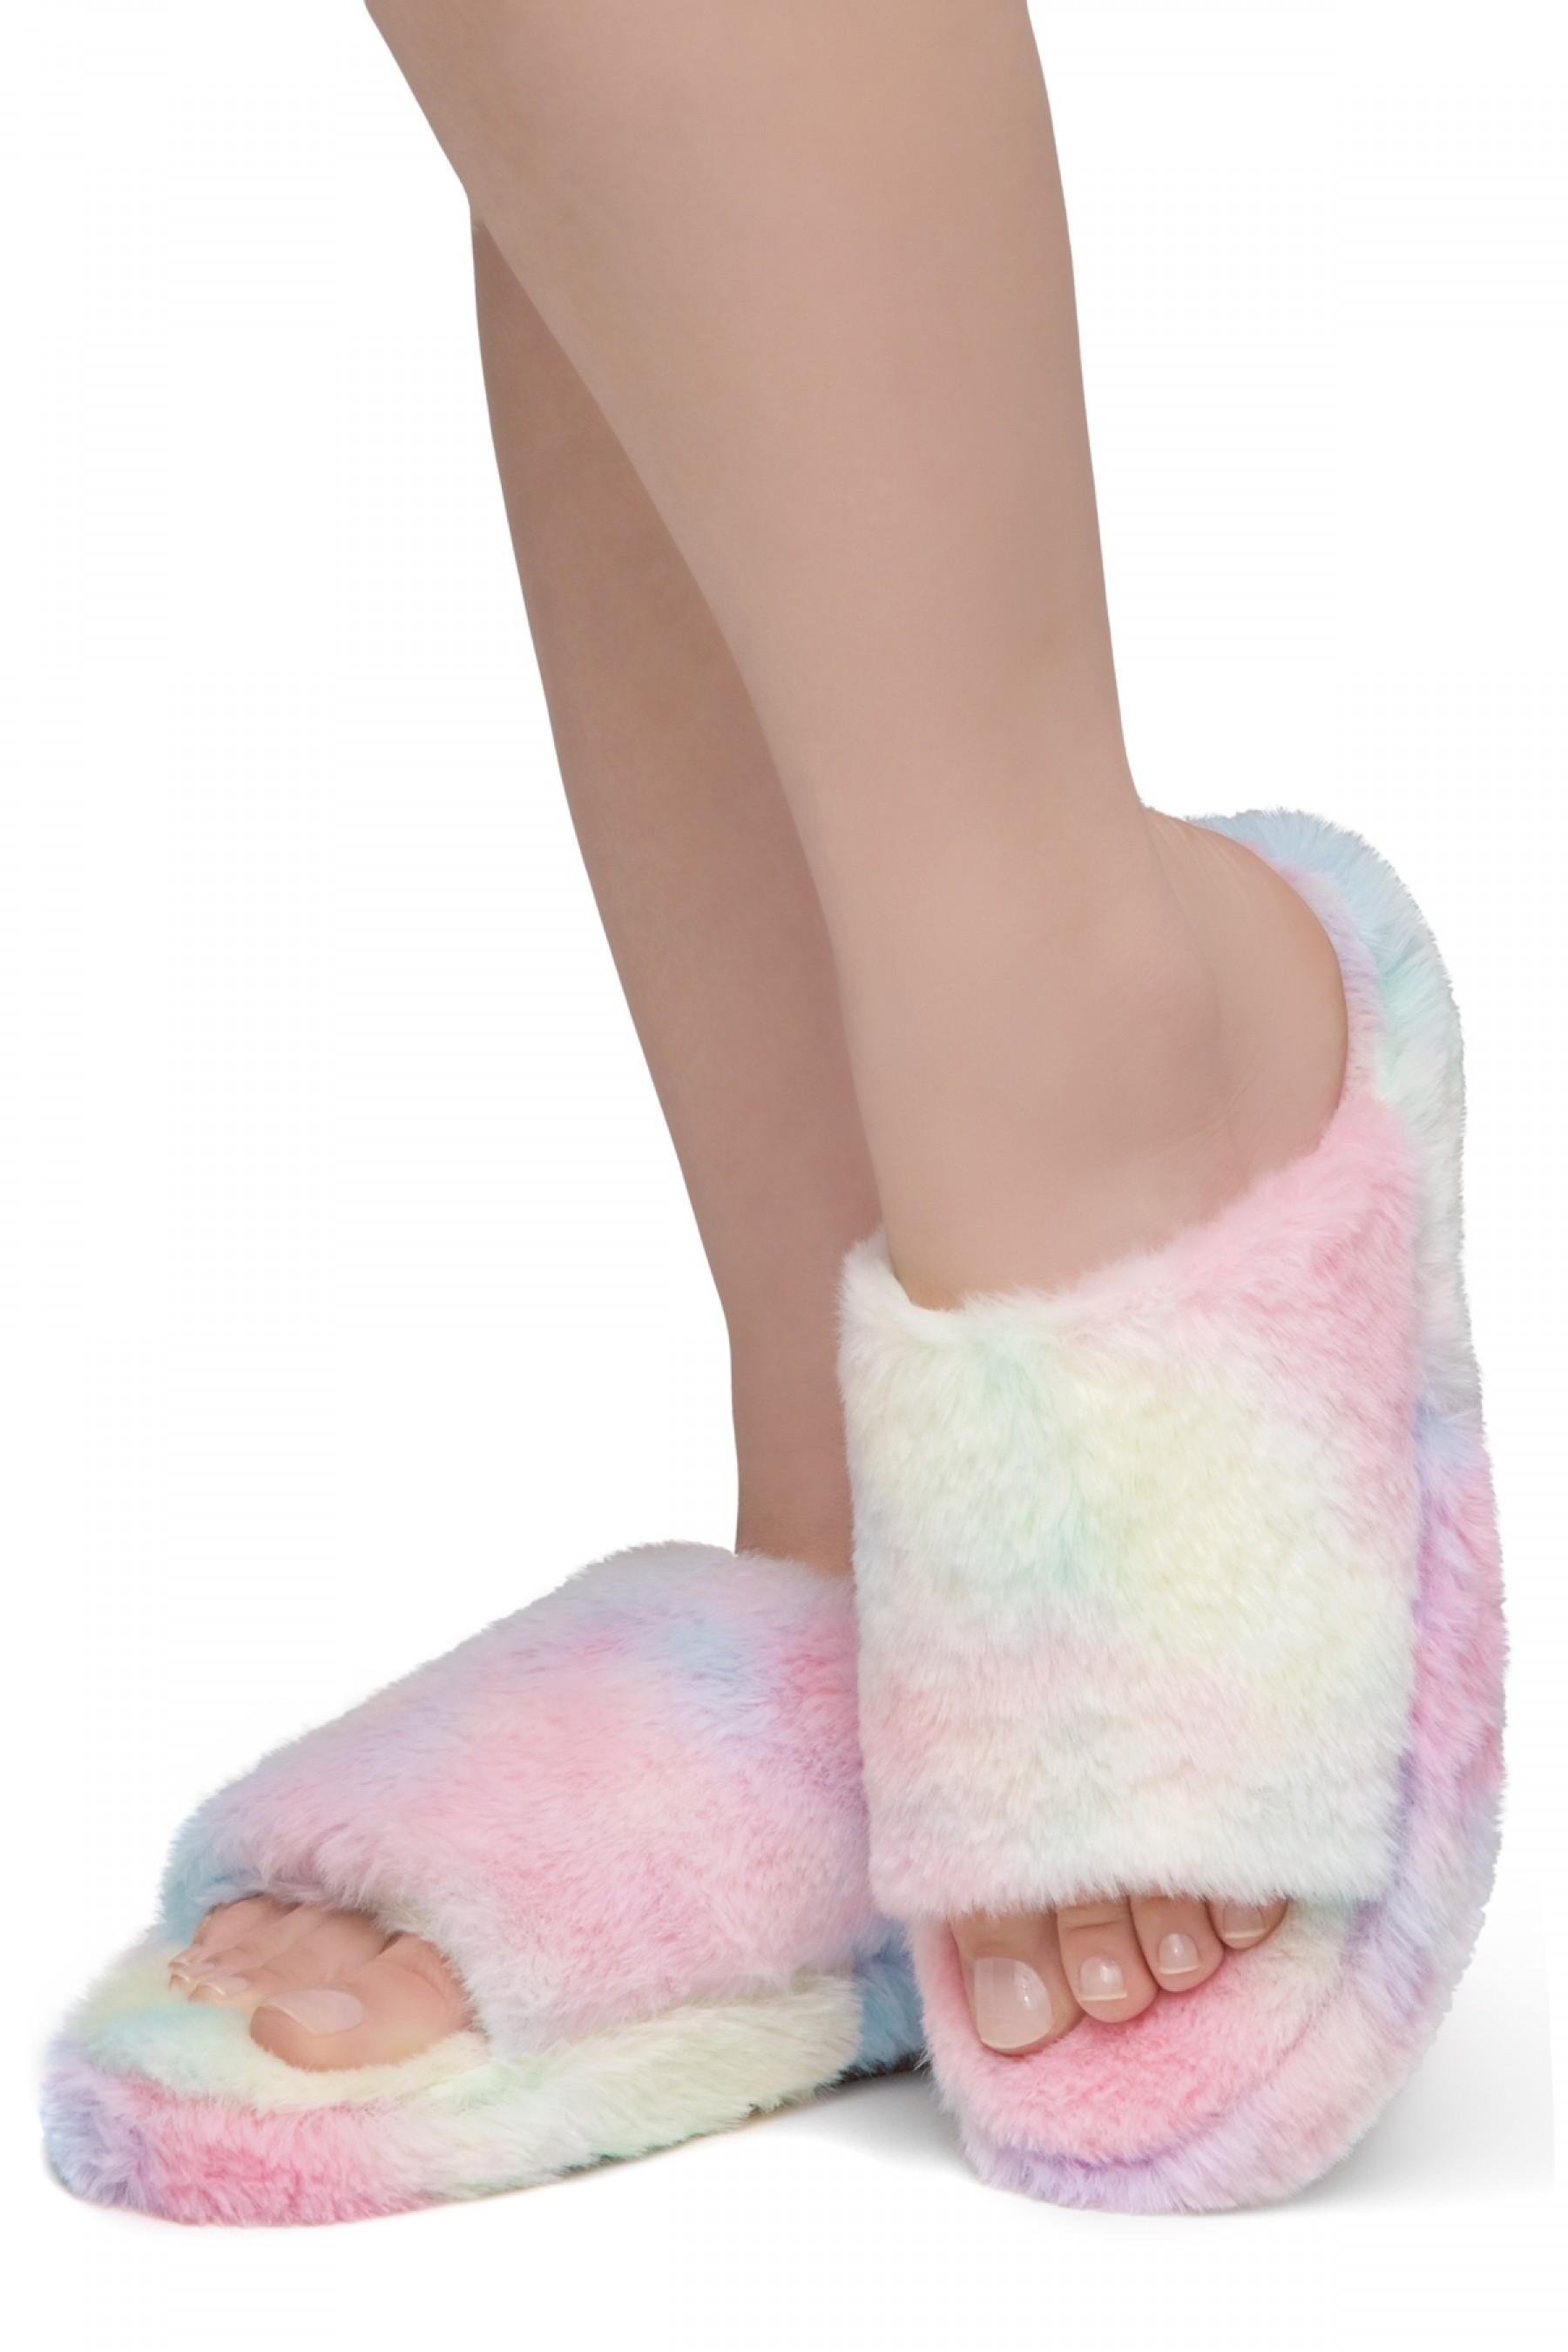 Shoe Land SL-McKenna Womens Fuzzy Slides Open Toe Casual Platform Wedge Sandals Plush Fleece Indoor or Outdoor Slippers (2020/MULT)